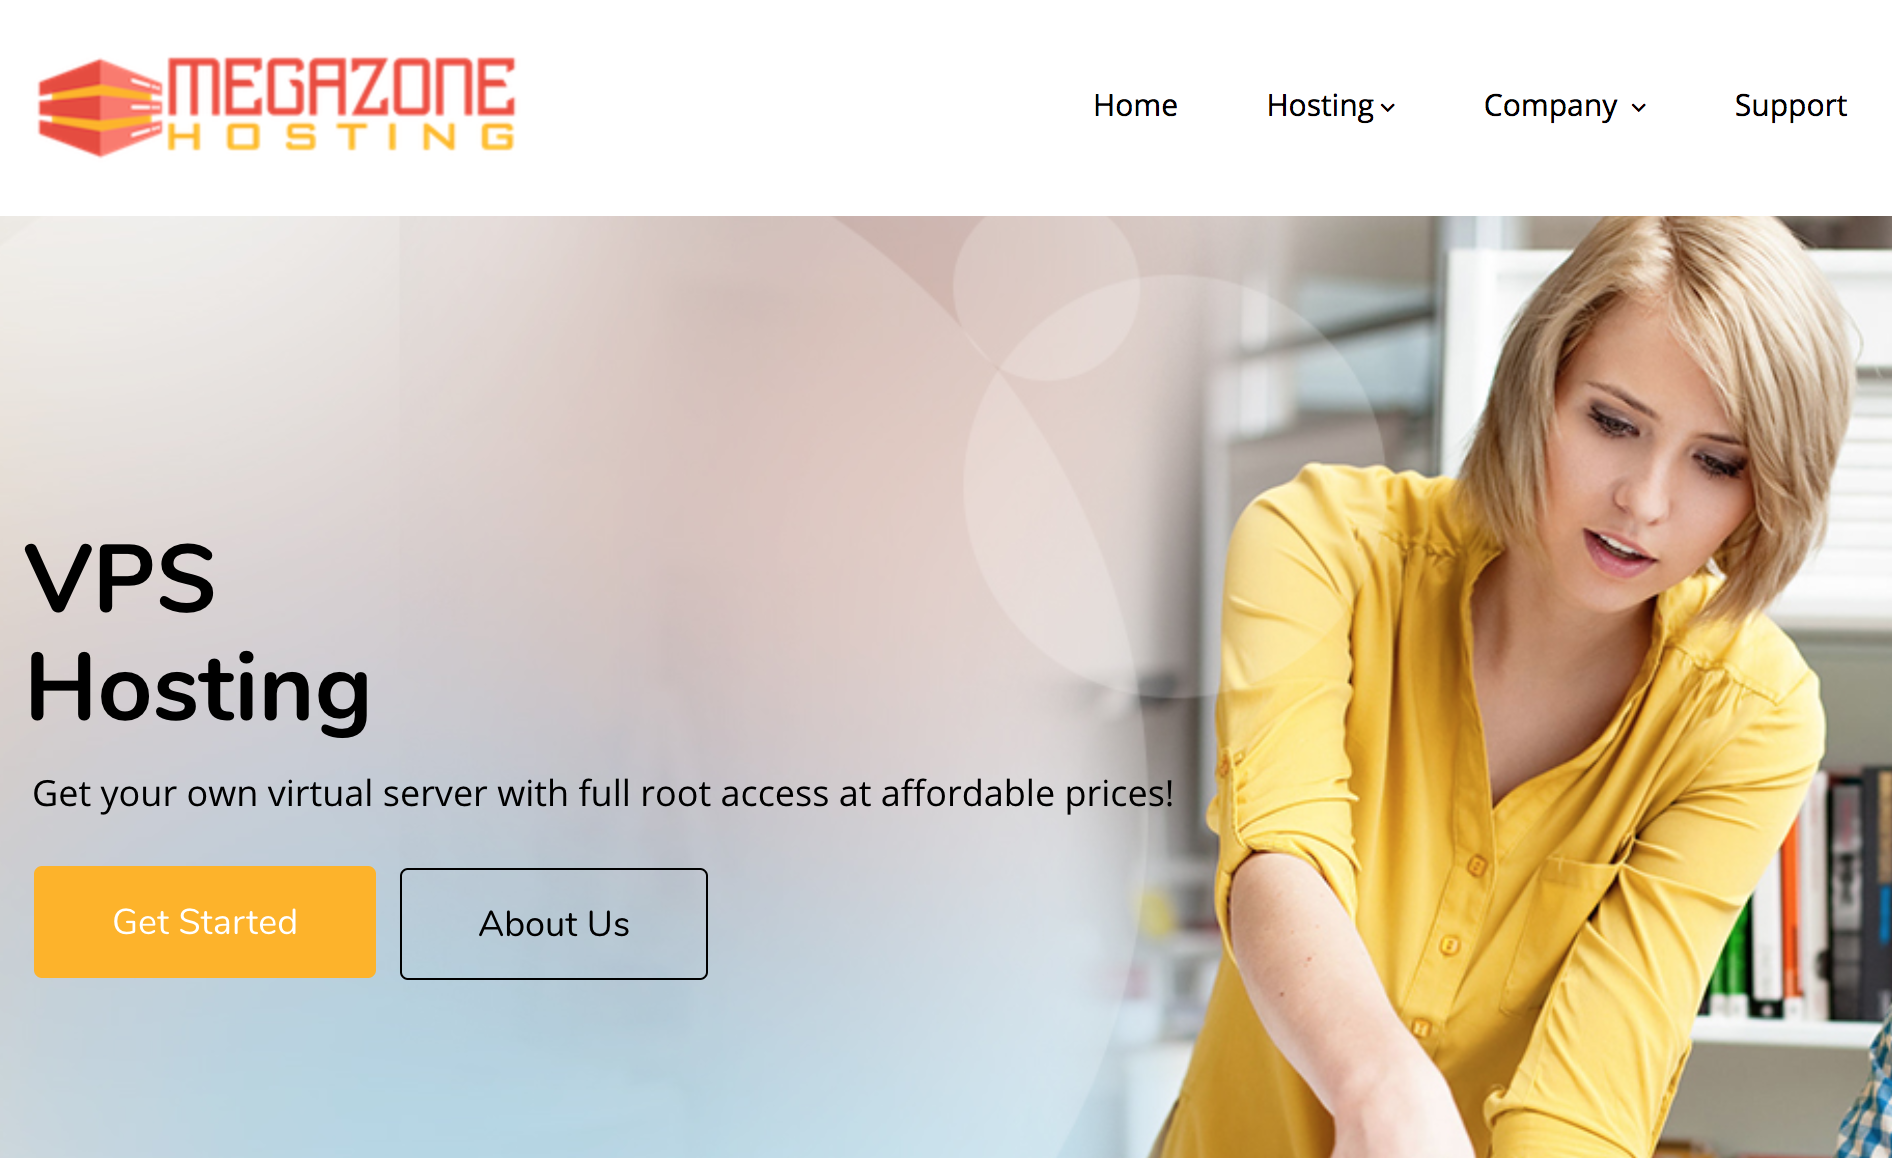 MegaZoneHosting-VPS-年付14美元RAM: 1.5GB-SSD: 20GB - MegaZoneHosting优惠信息